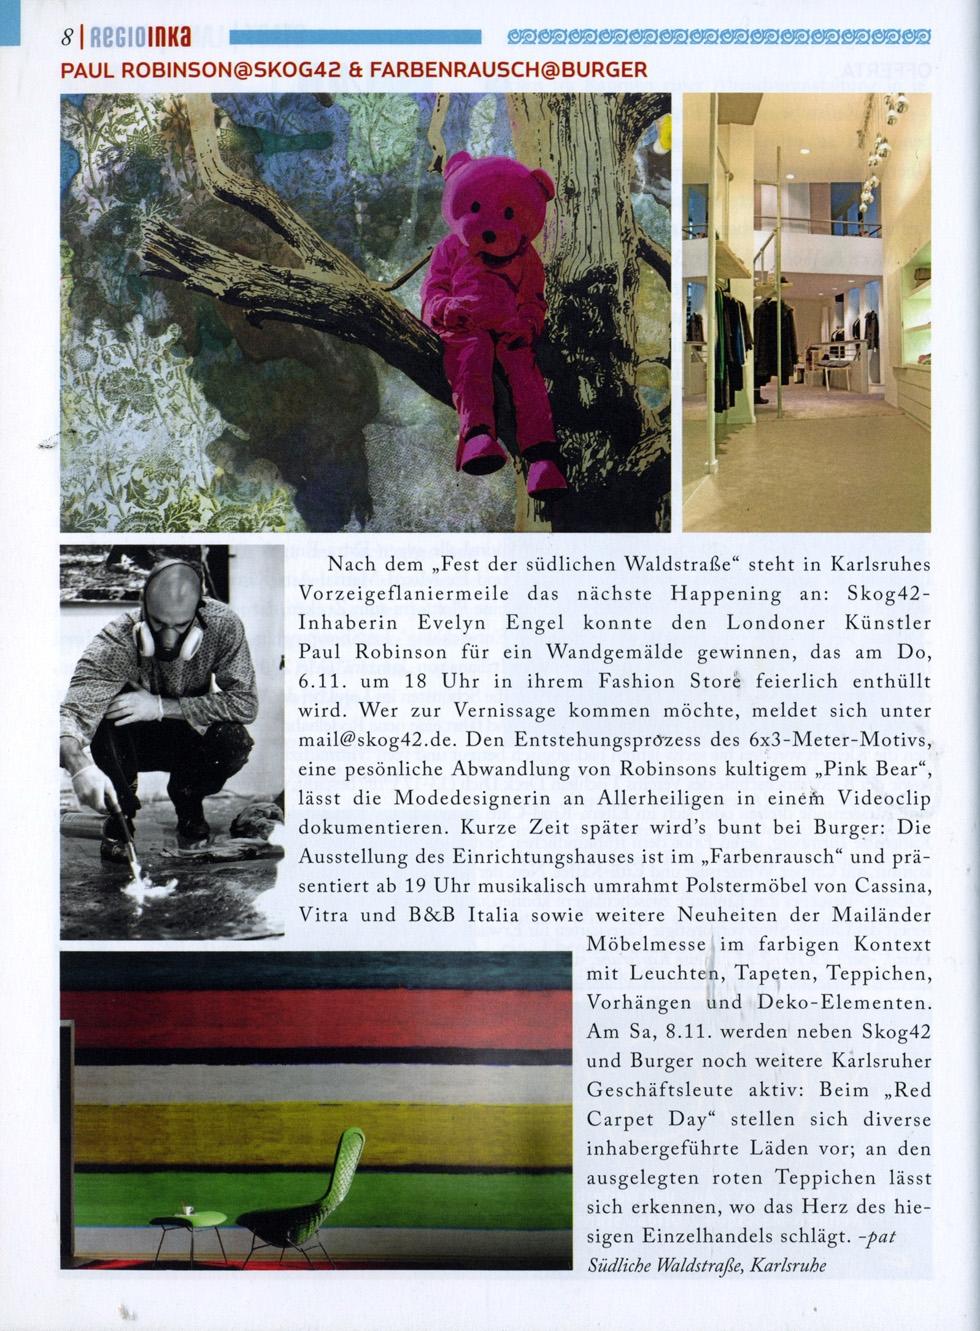 Paul Robinson featured in Regio Inka